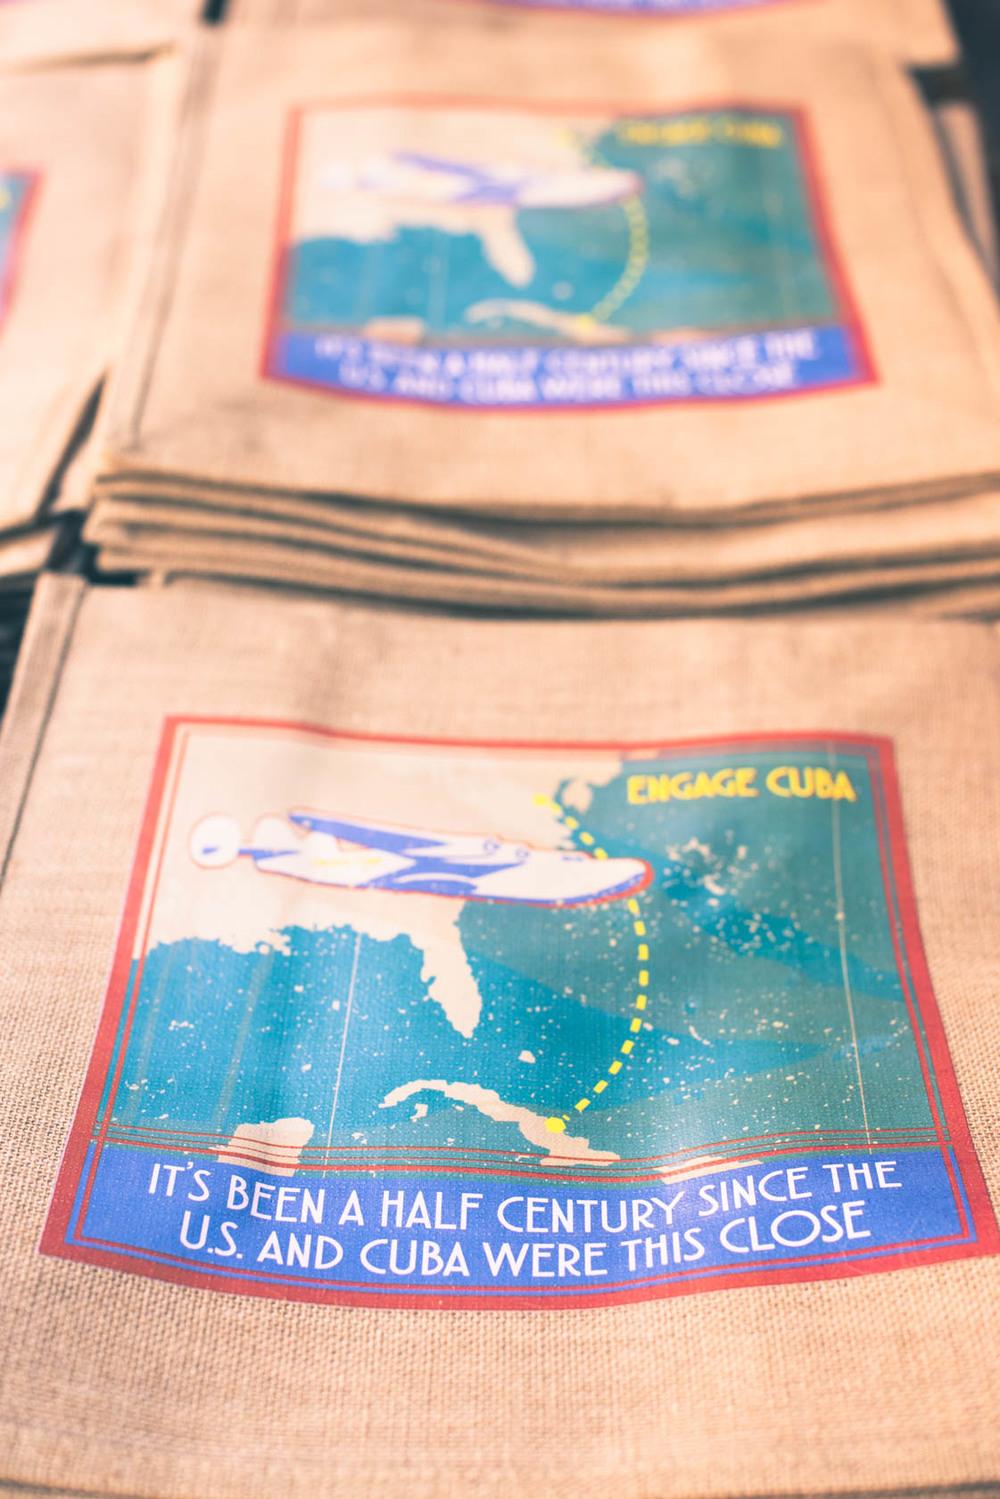 Engage Cuba 061615-6.jpg